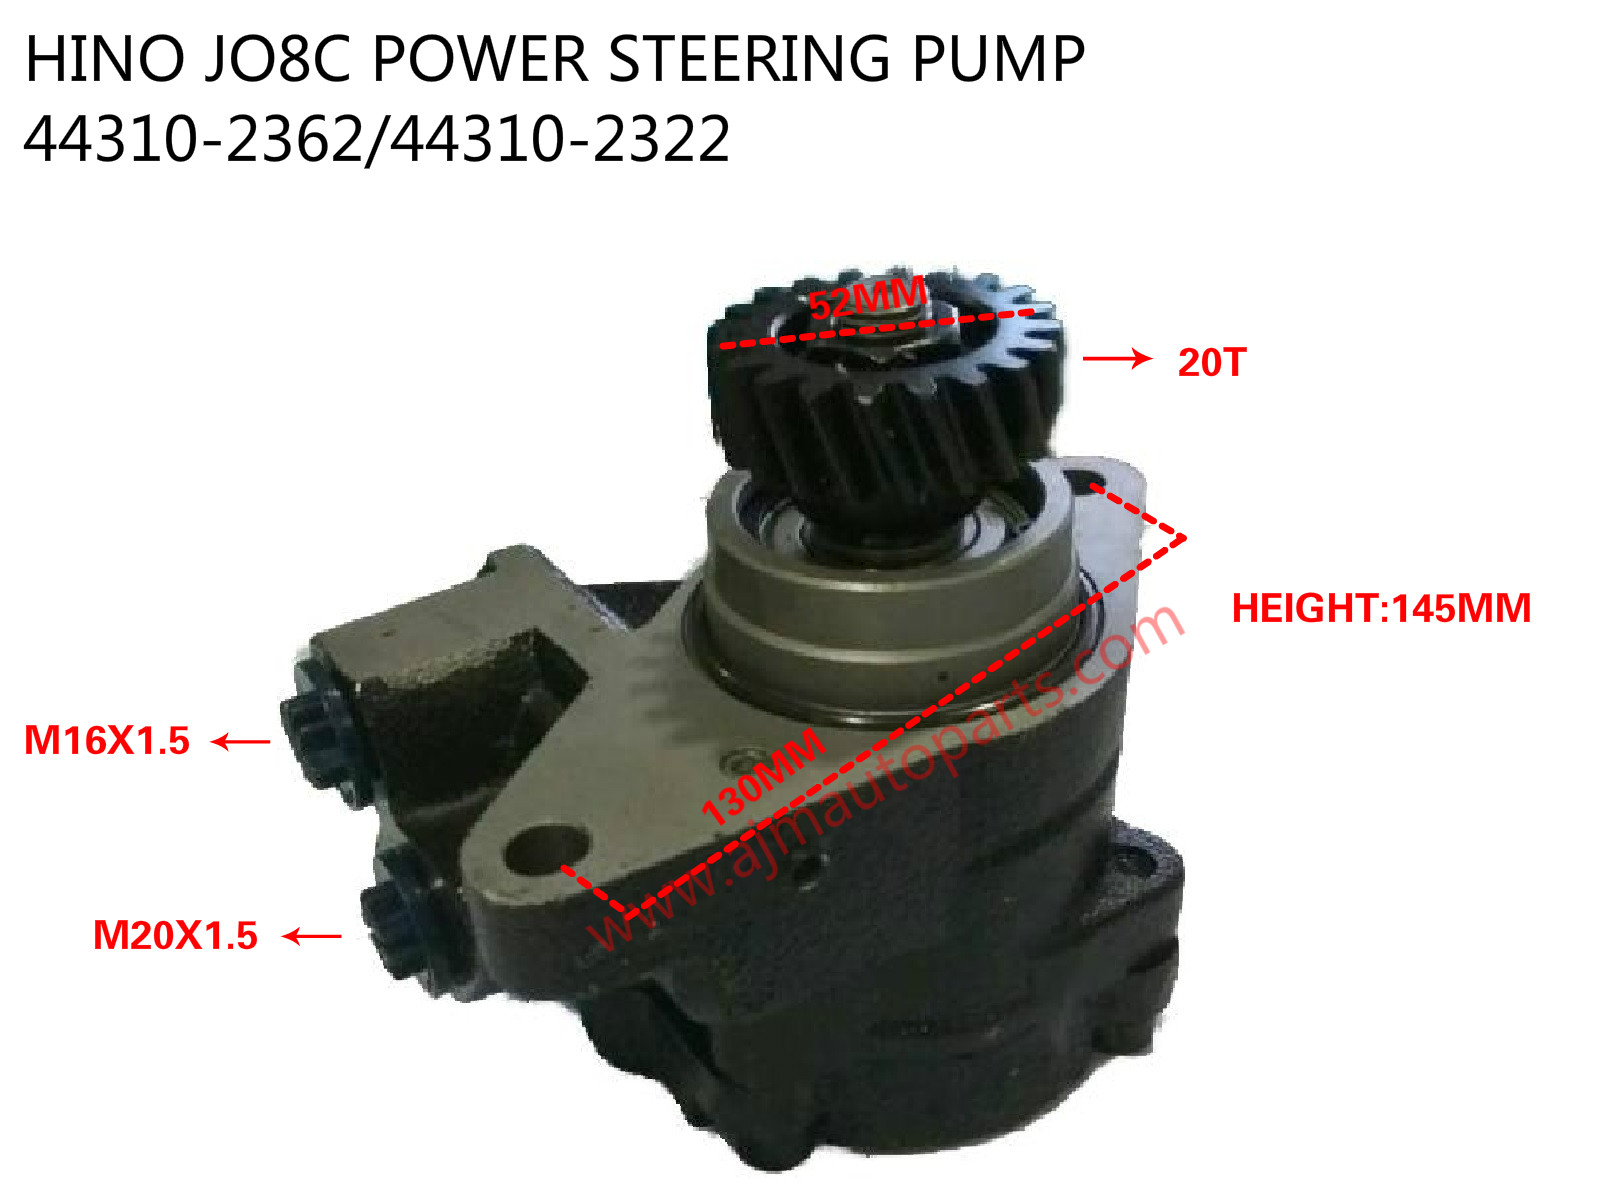 HINO JO8C POWER STEERING PUMP-44310-2362+44310-2322